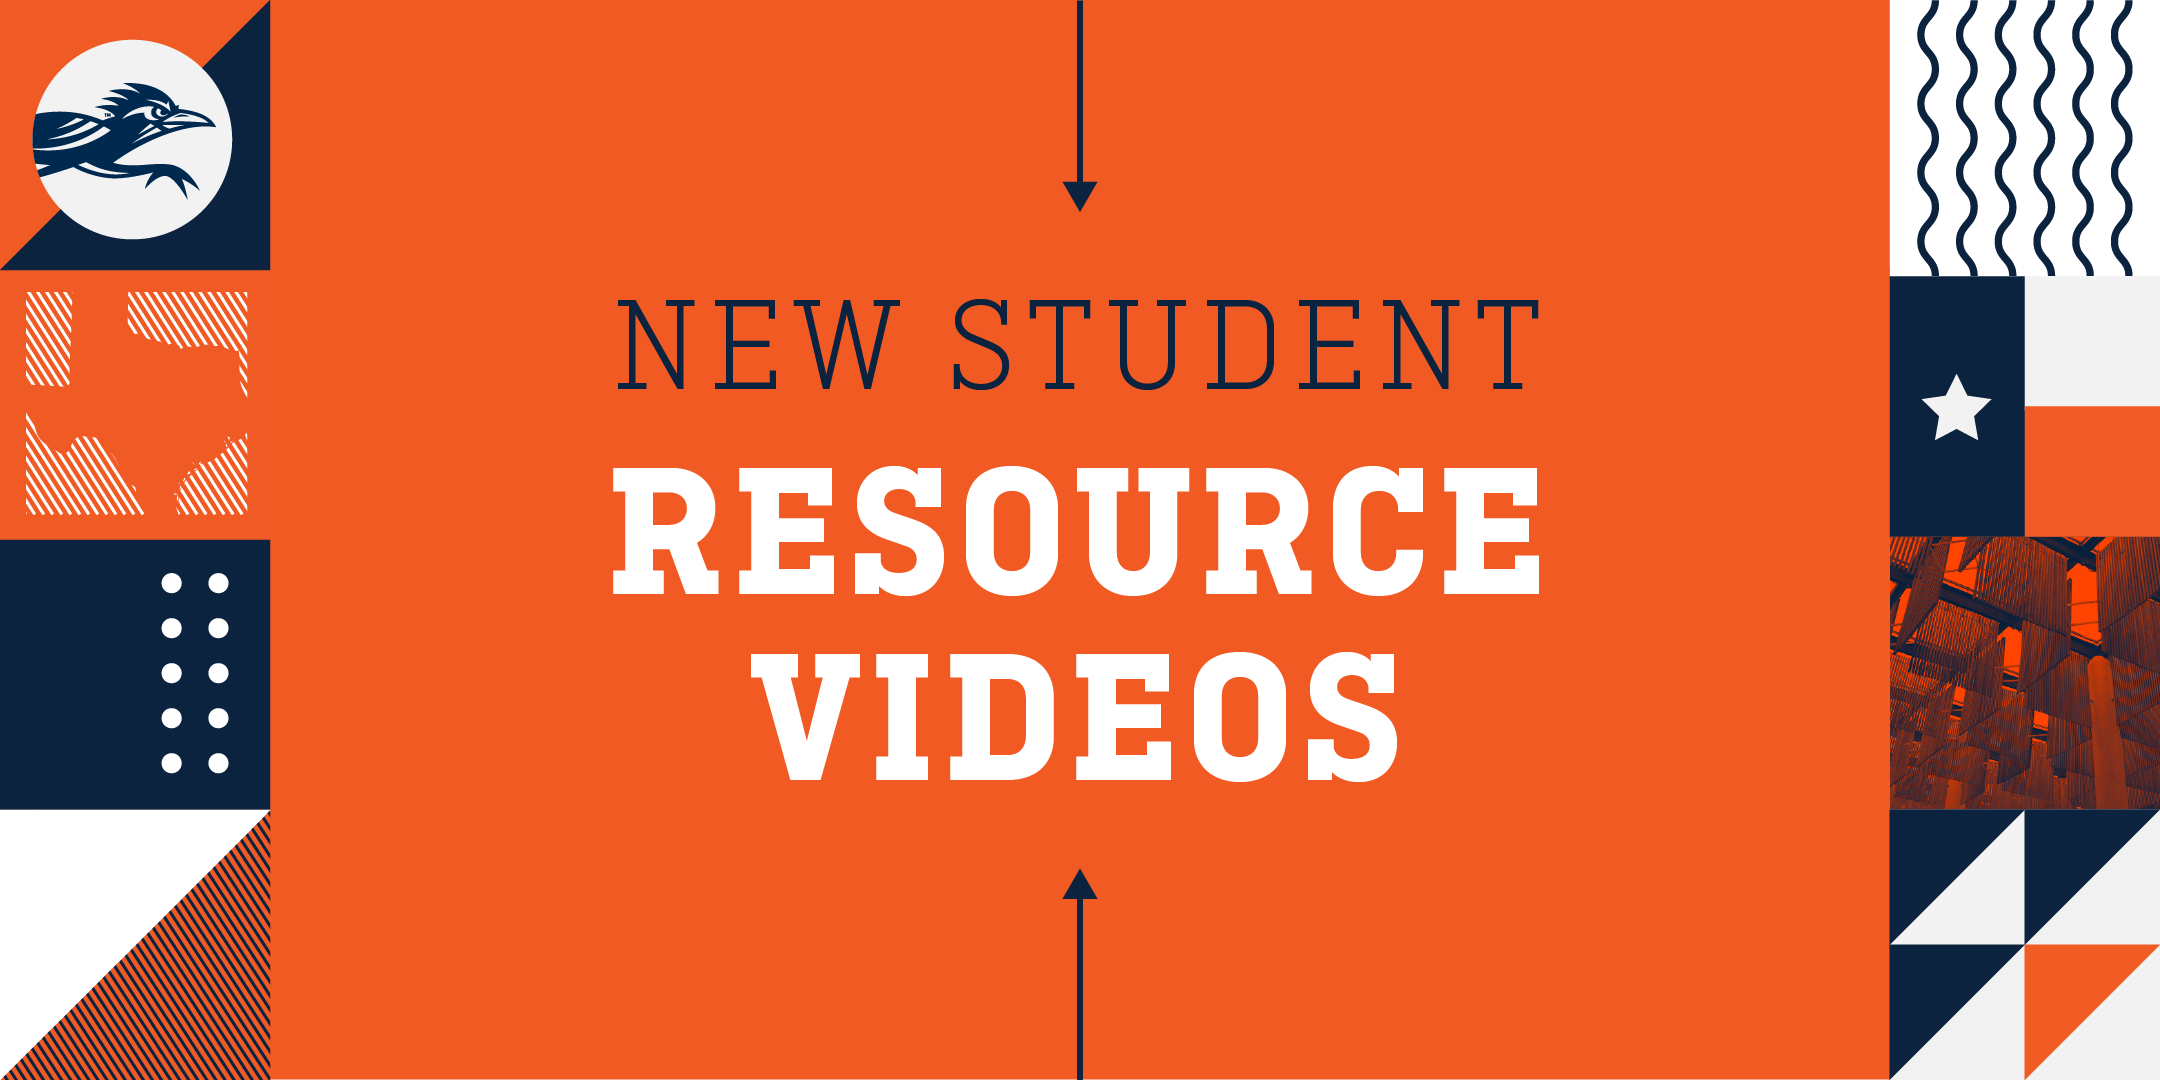 New Student Resource Videos